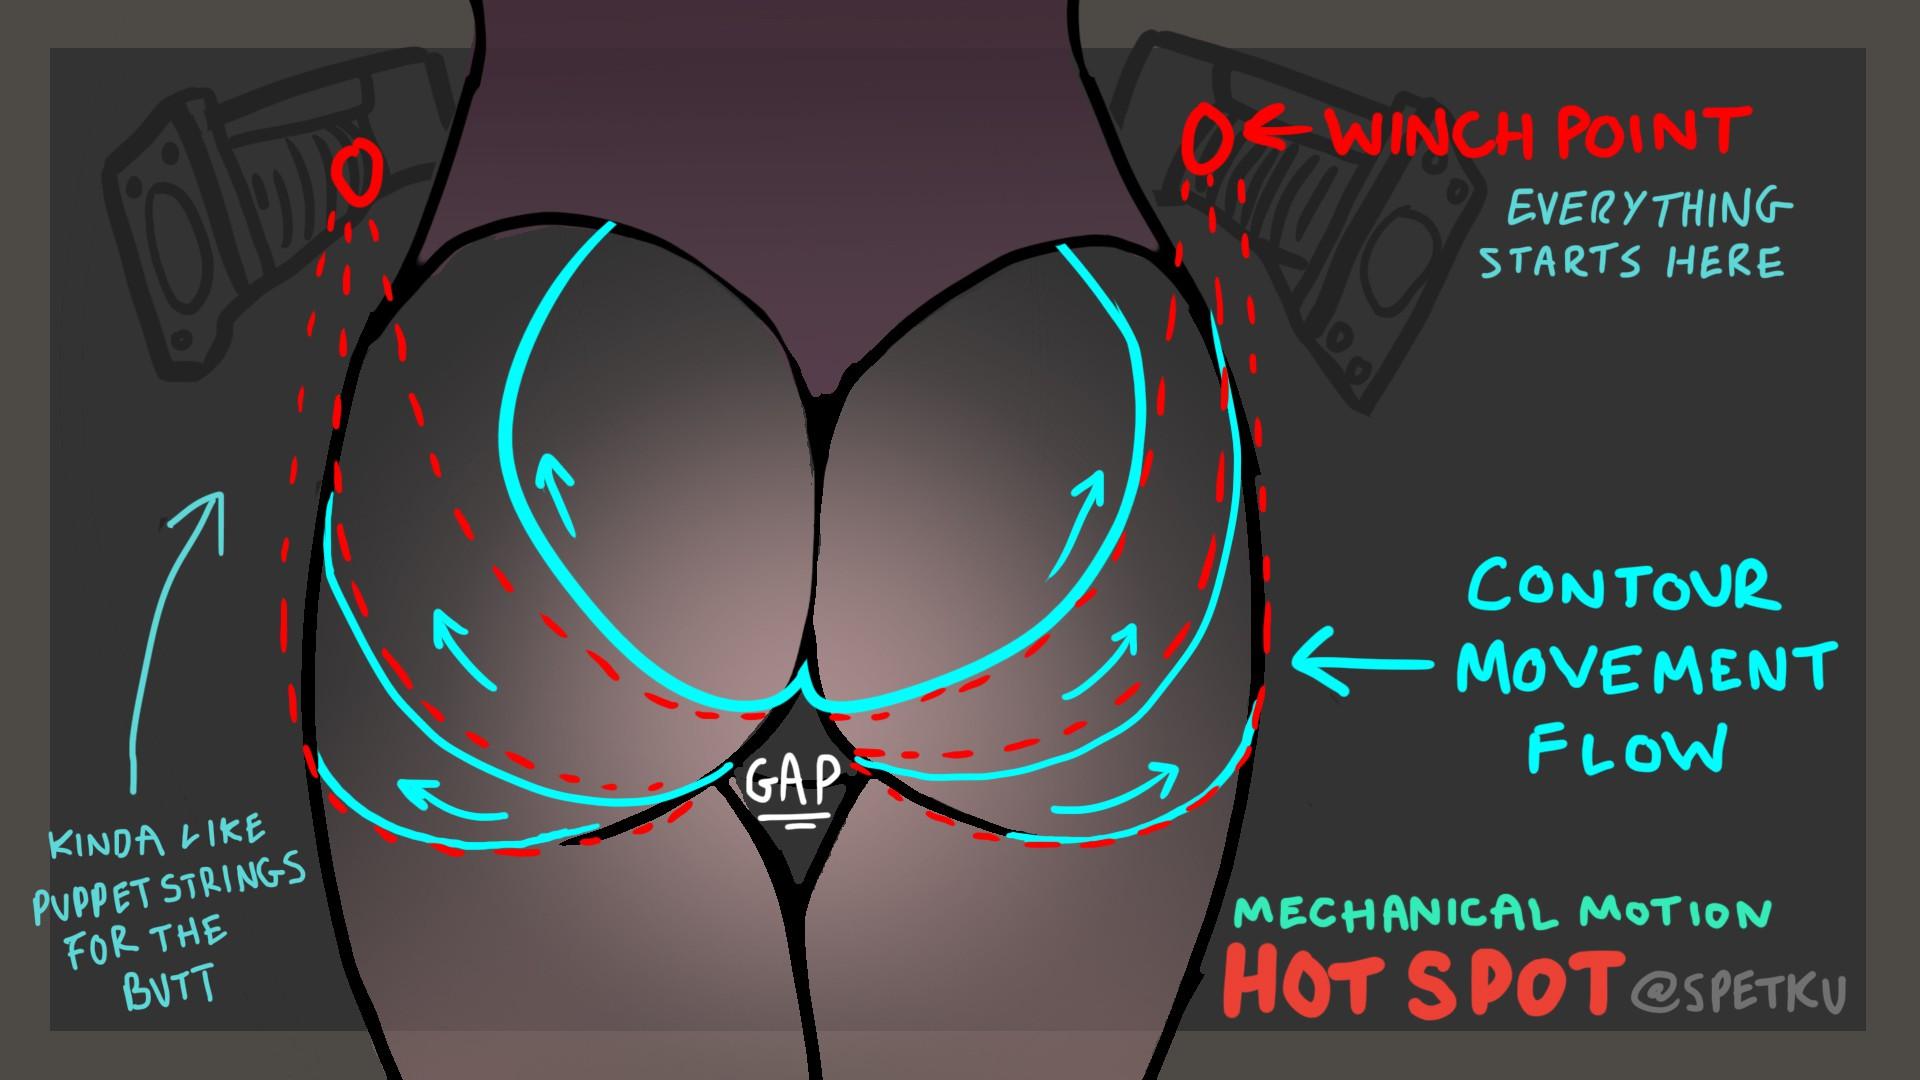 she bon shebon hot spot creating gap where there's heat